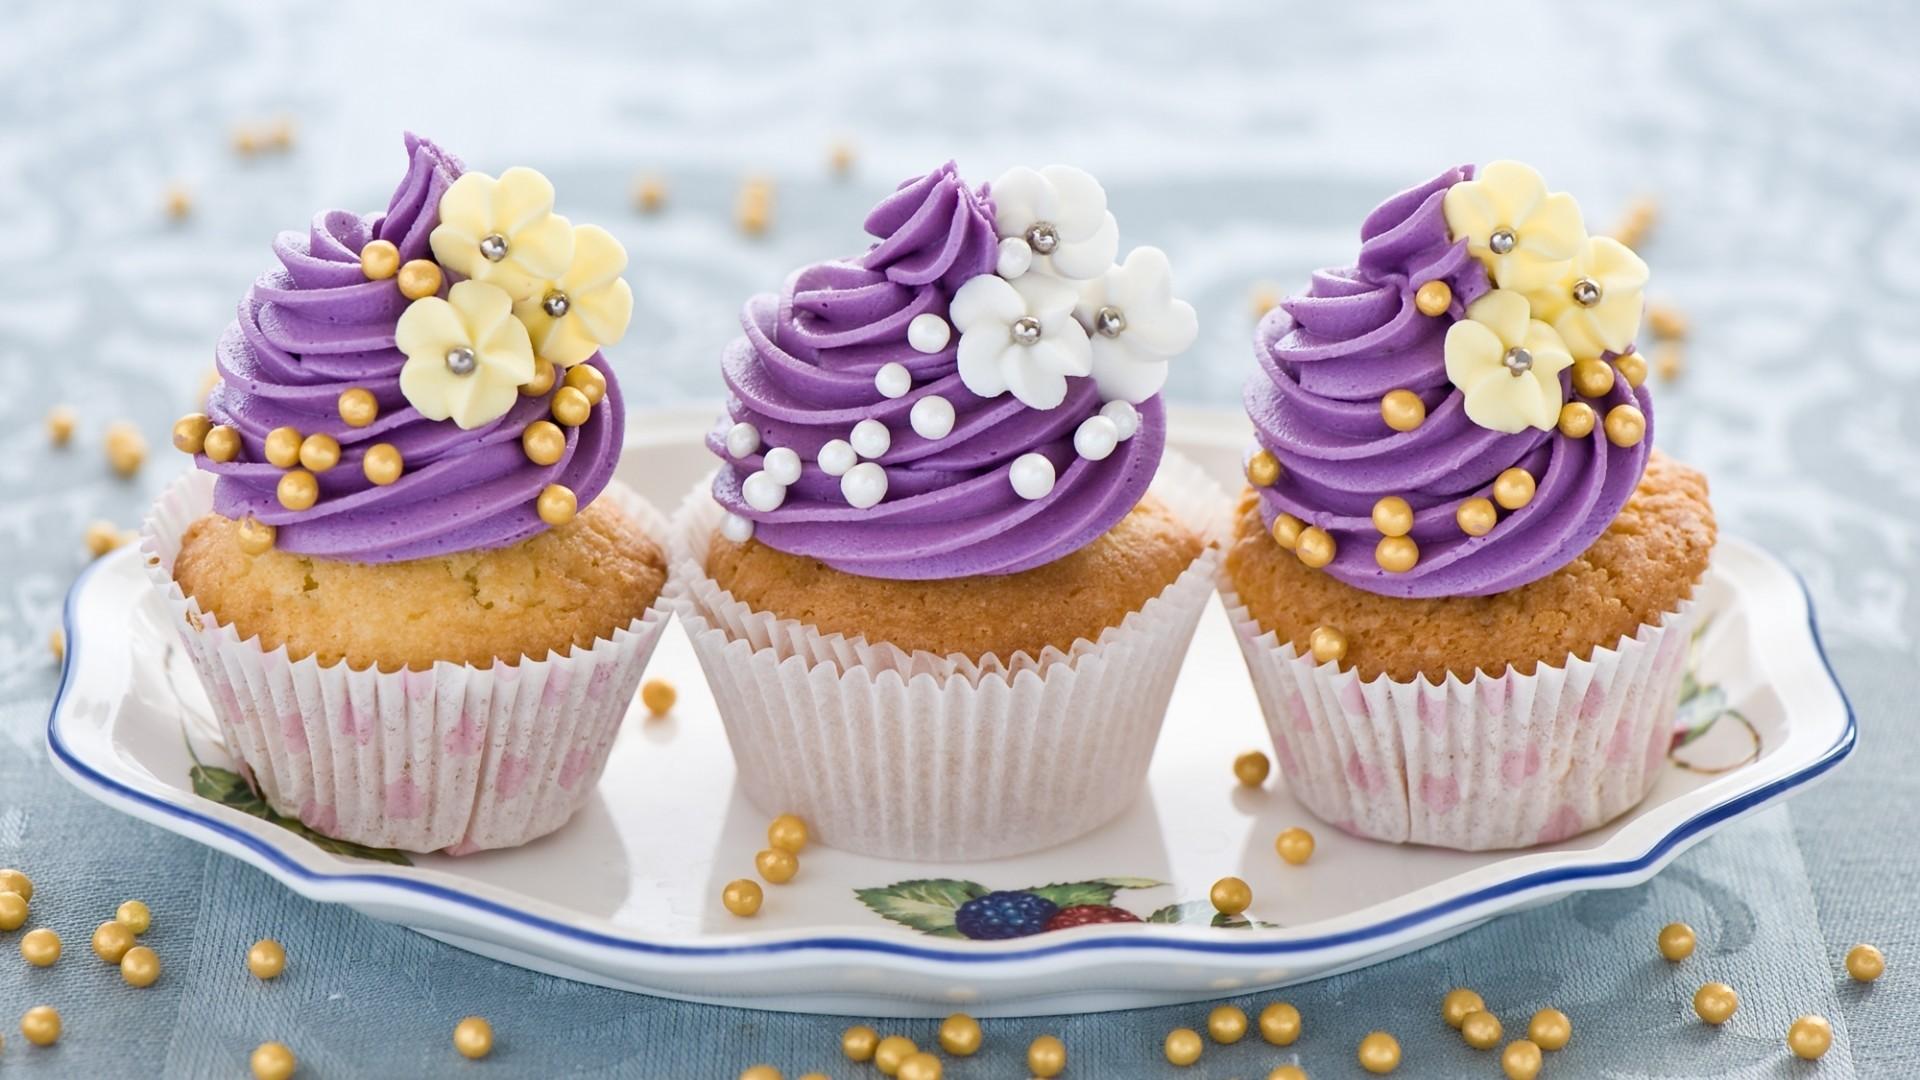 Cupcake Wallpaper Picture hd